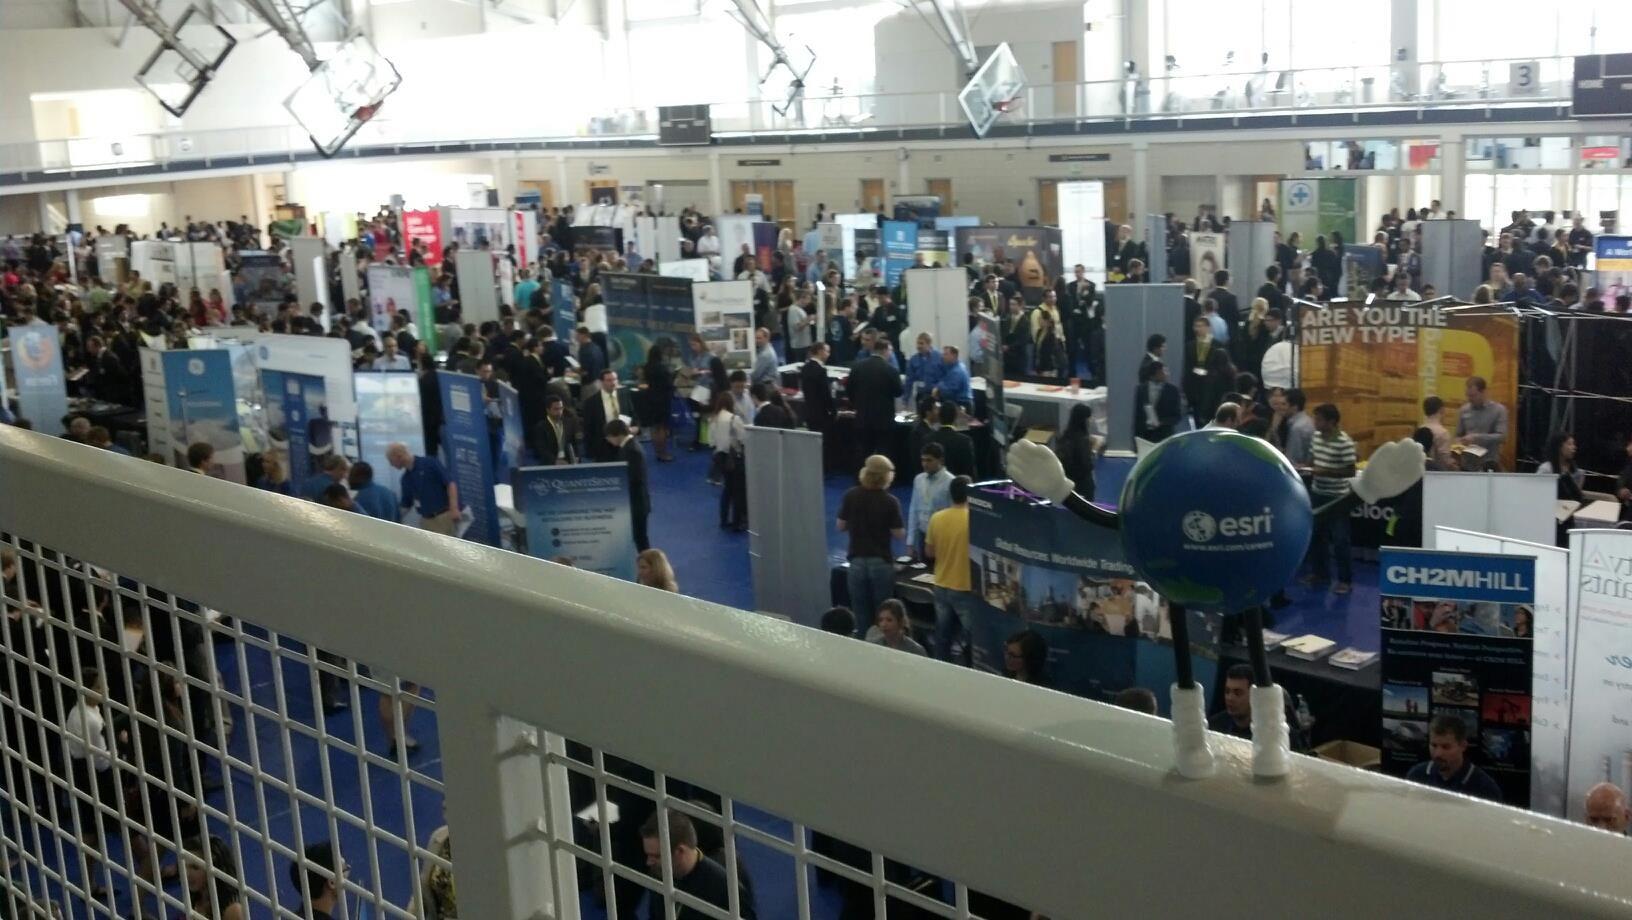 Esri recruiters at the Tech Fall Career Fair, in